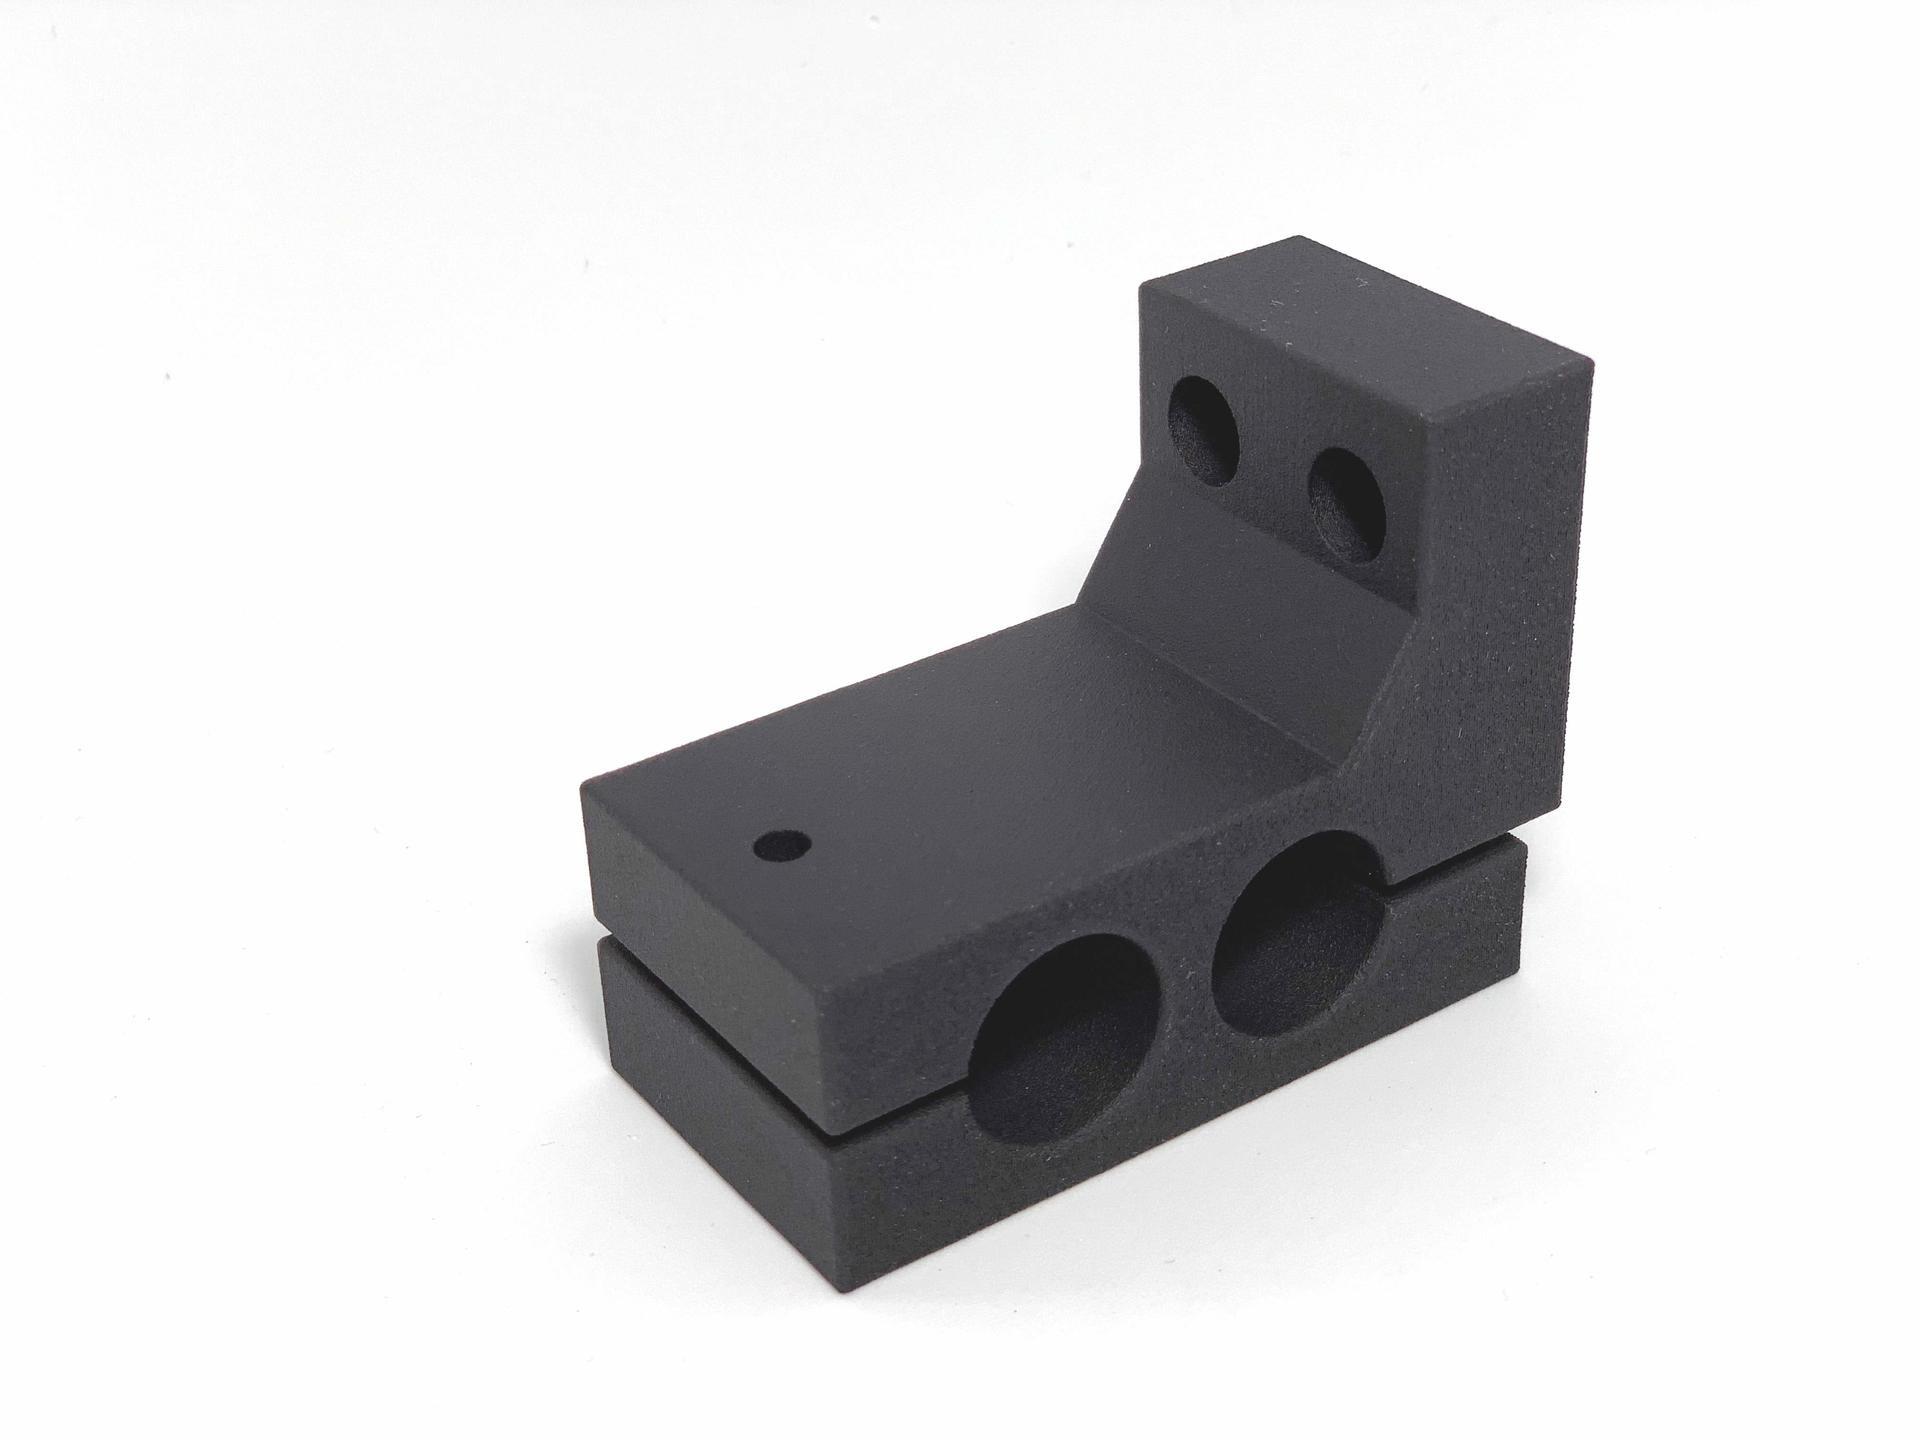 Designed for CNC